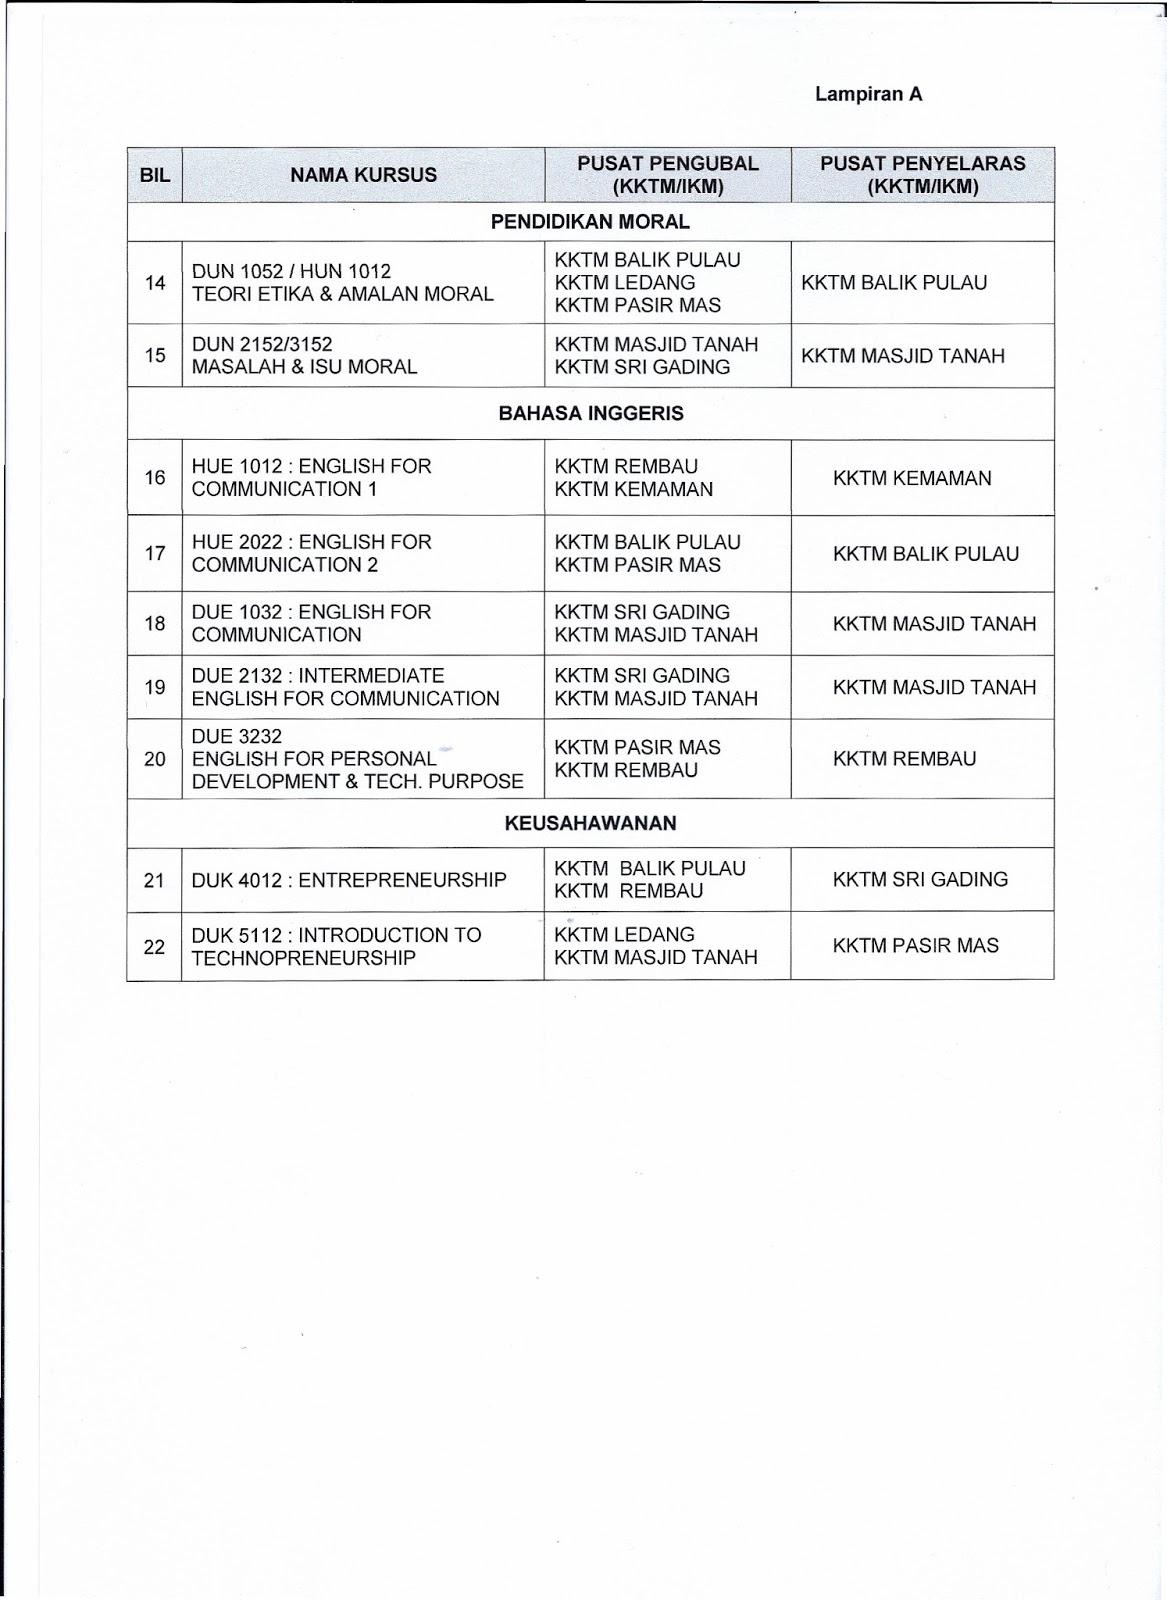 ARAHAN PENYEDIAAN KERTAS SOALAN DAN SKEMA PEMARKAHAN SESI JAN-JUN 2013